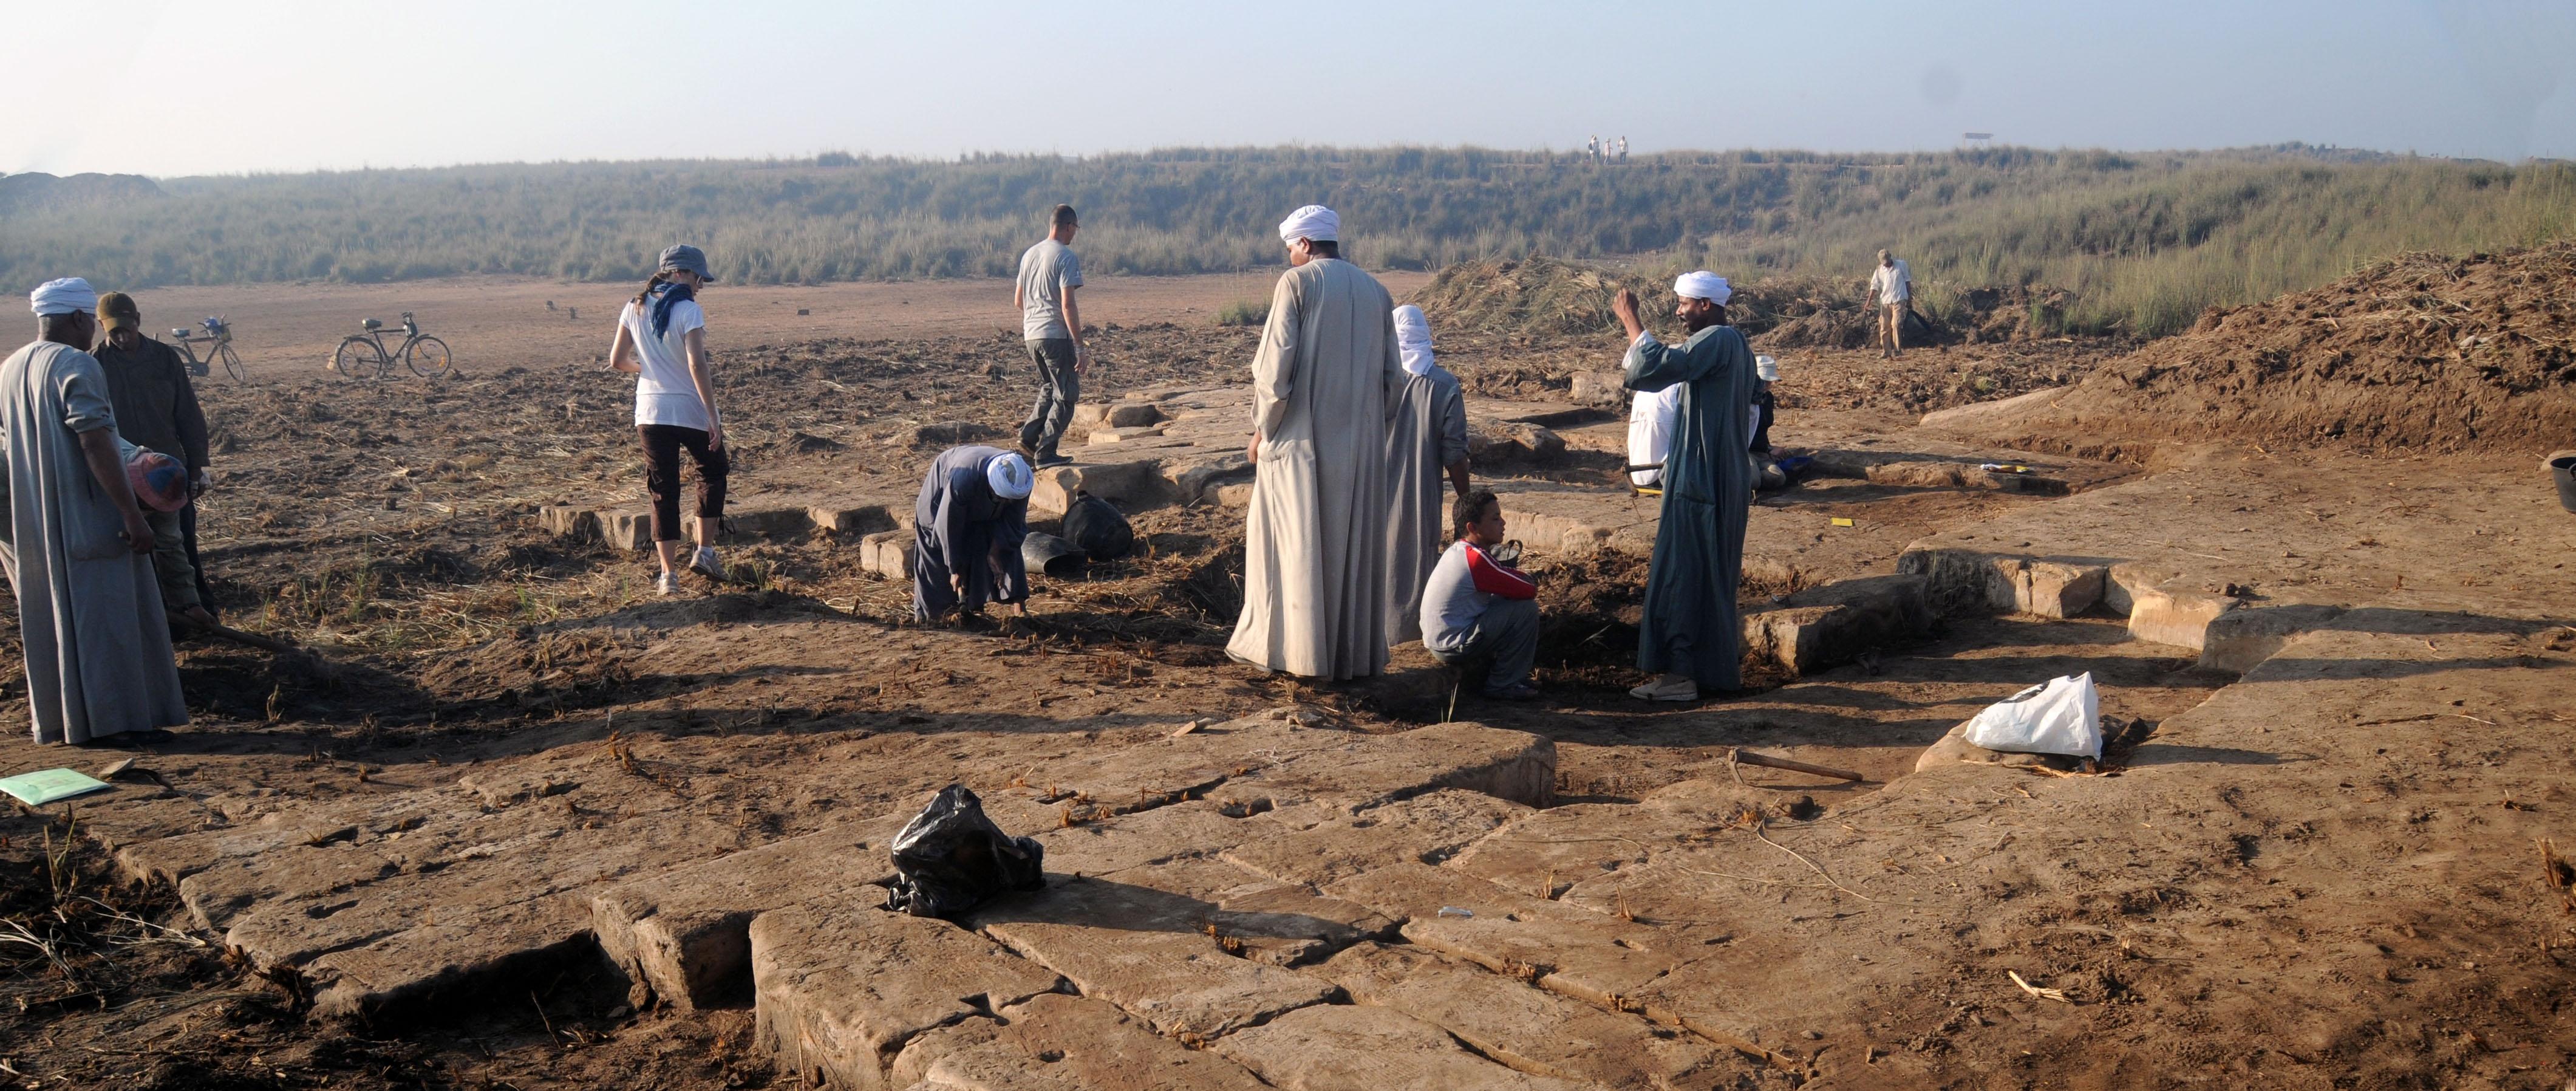 http://divingarchaeology.files.wordpress.com/2012/02/s004270709opy1.jpg